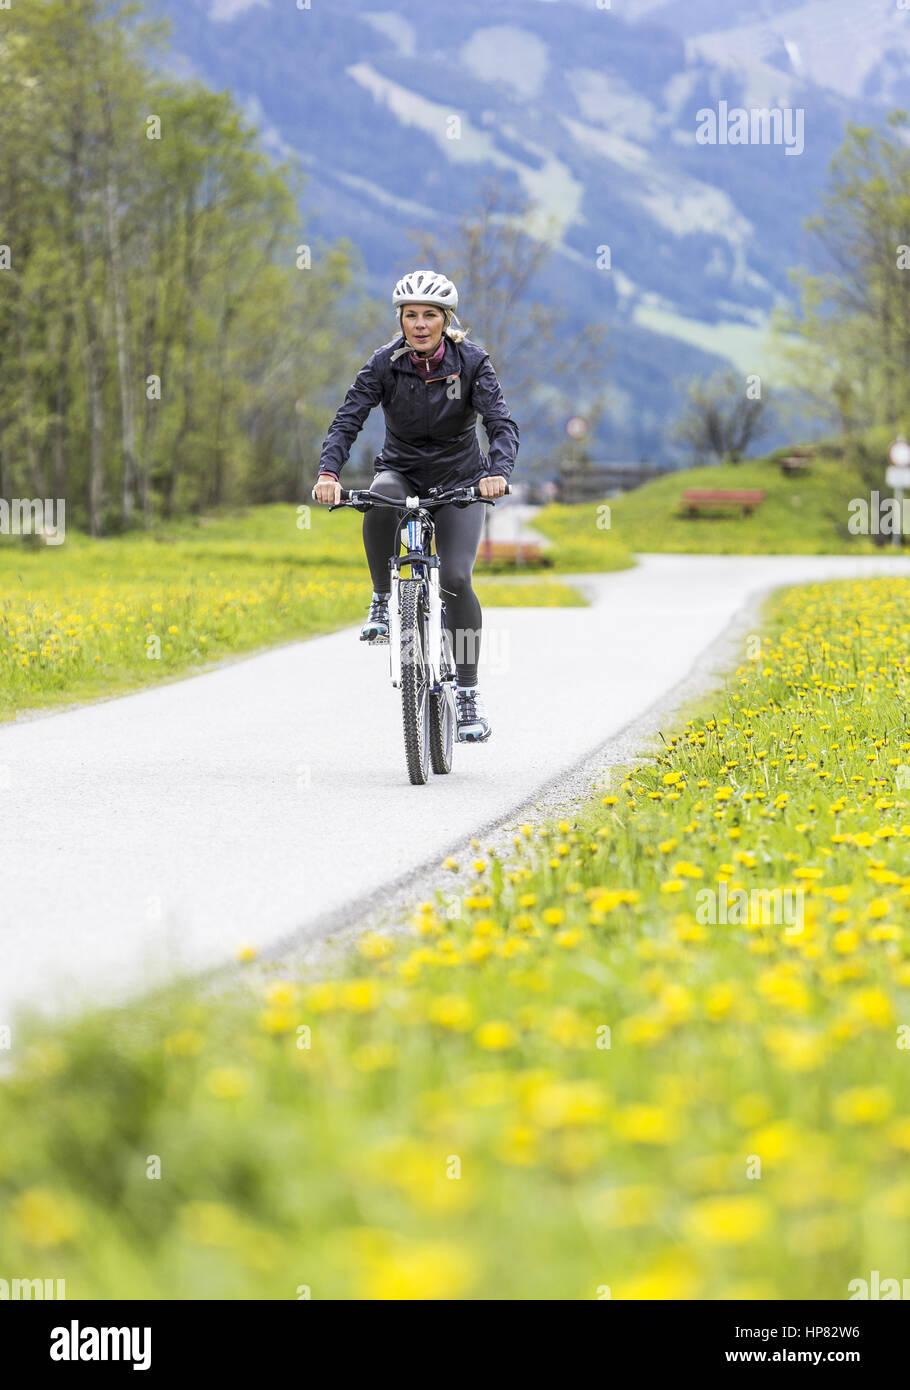 Frau beim Fahrrad fahren (model-released) Stock Photo